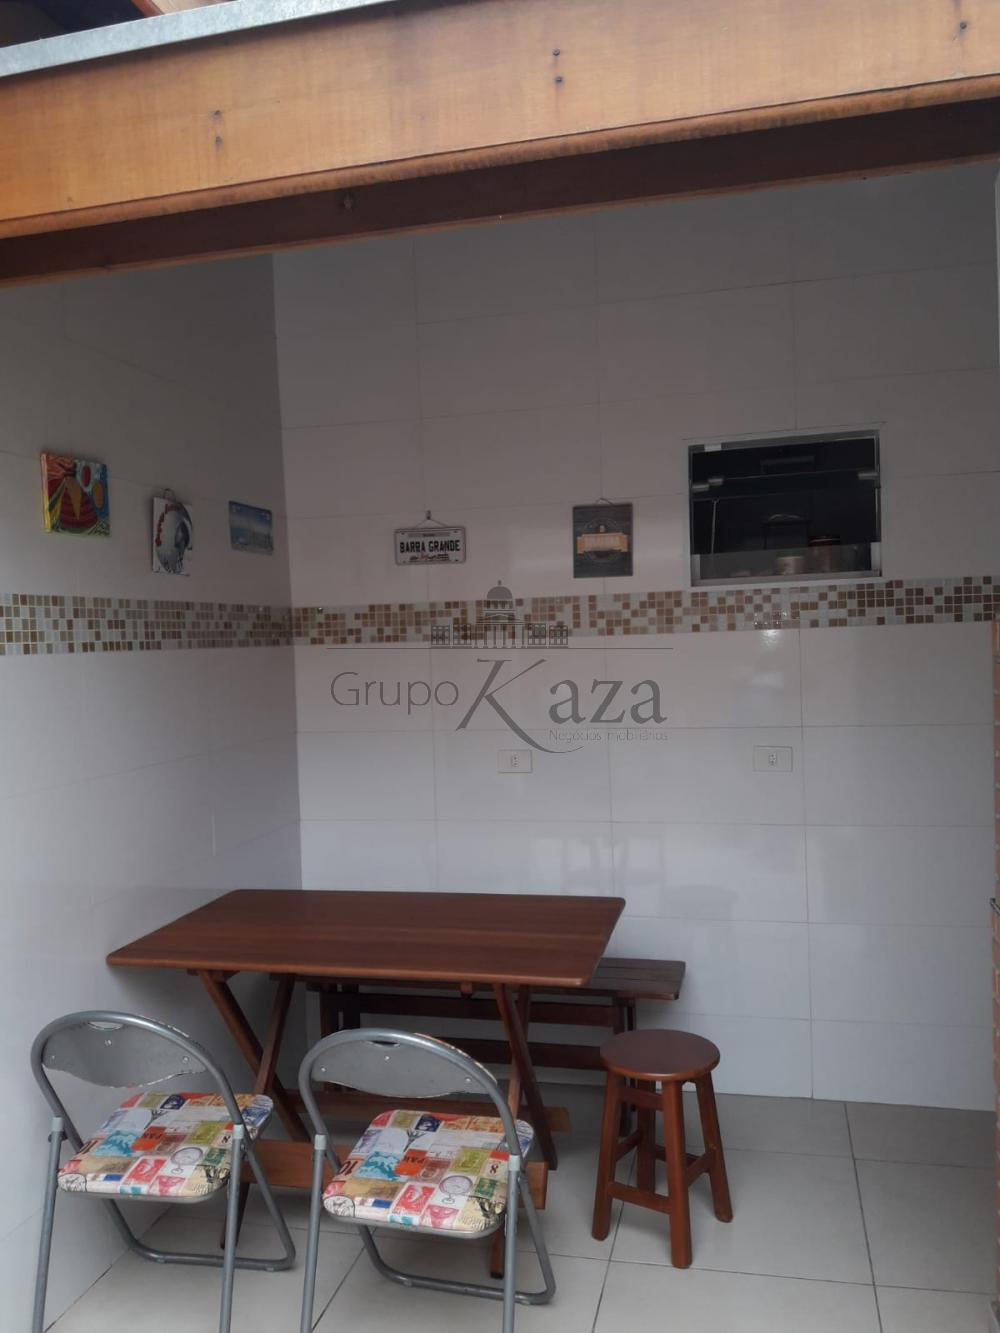 alt='Comprar Casa / Térrea em Jacareí R$ 375.000,00 - Foto 19' title='Comprar Casa / Térrea em Jacareí R$ 375.000,00 - Foto 19'